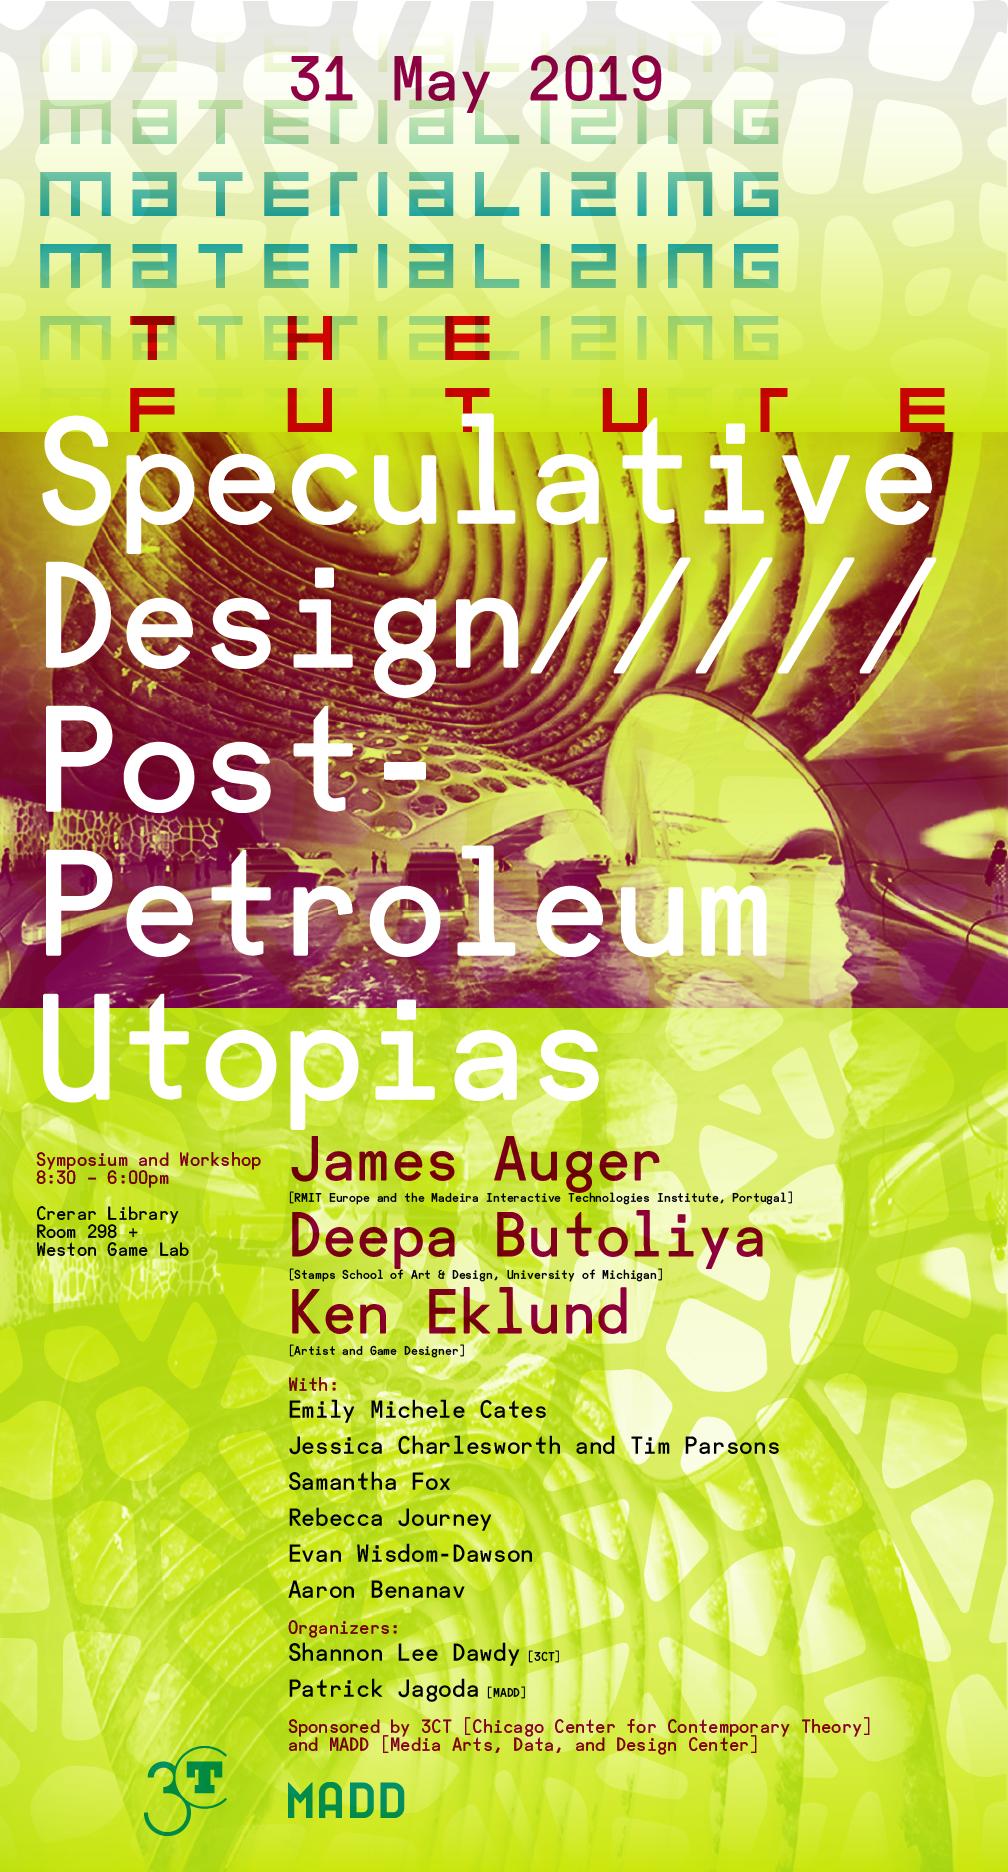 Speculative Design Poster for Post-Petroleum event